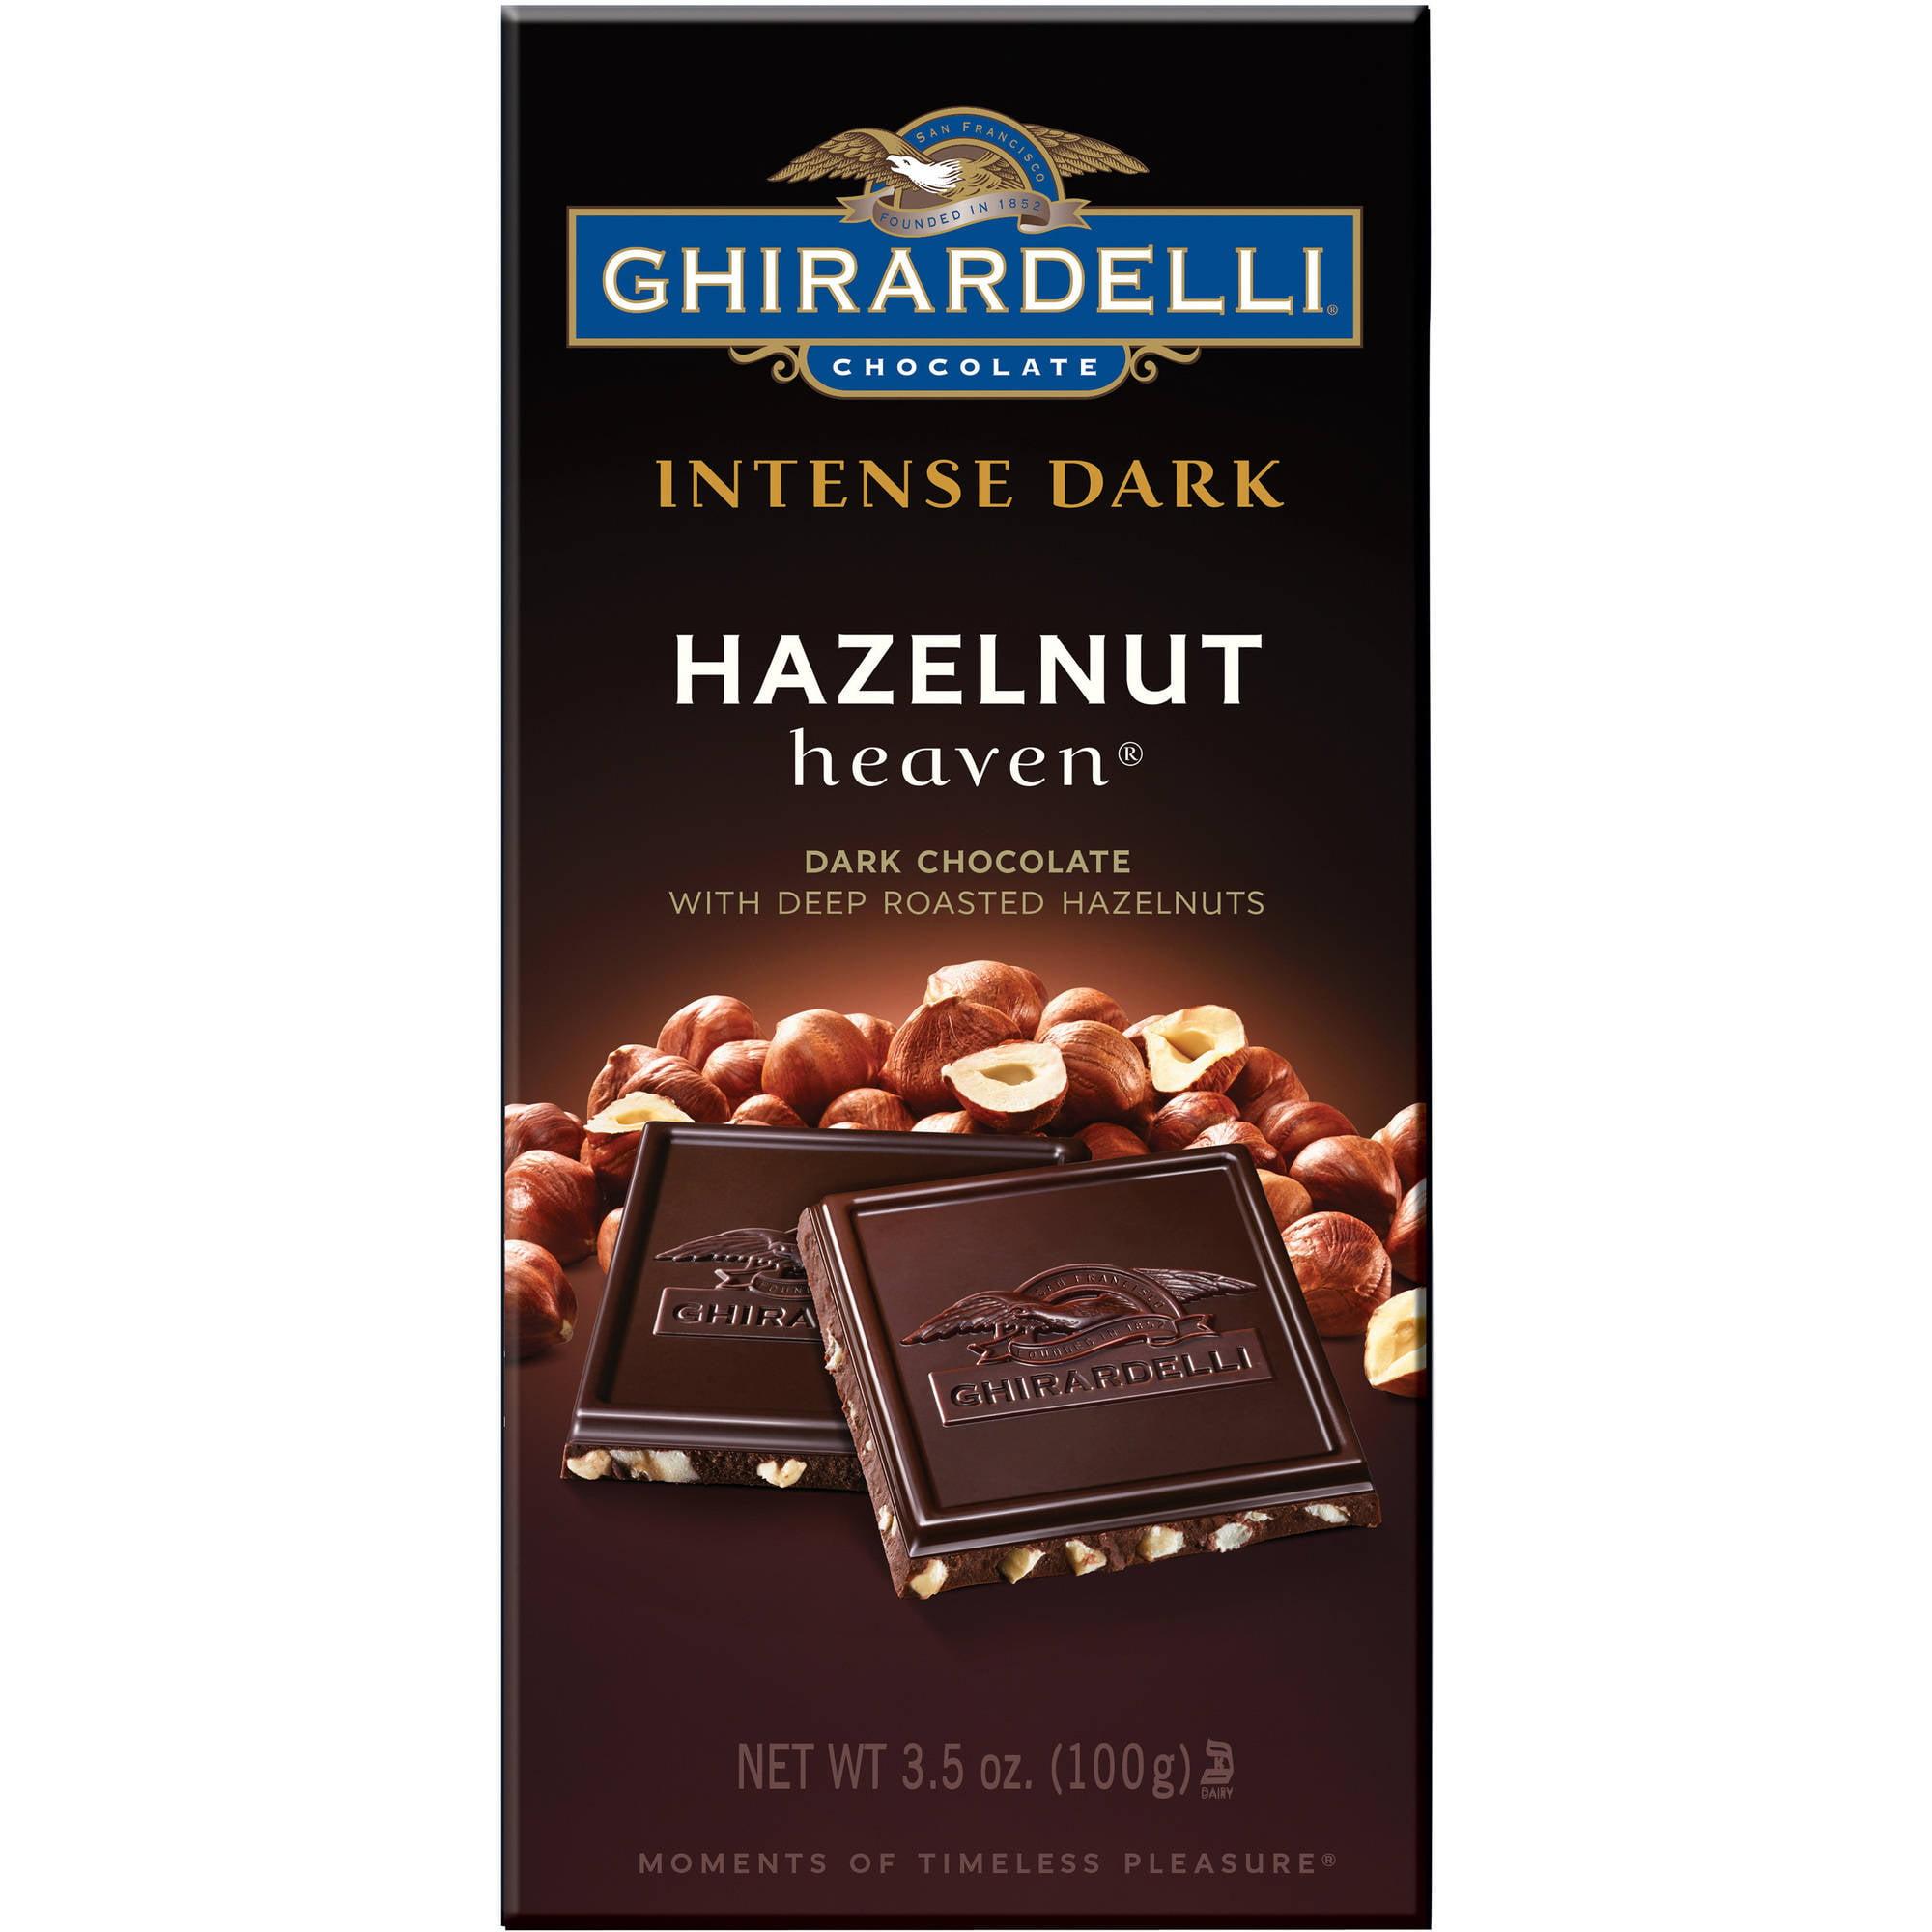 (3 Pack) Ghirardelli Chocolate Intense Dark Bar, Hazelnut Heaven, 3.5 Ounce Bars